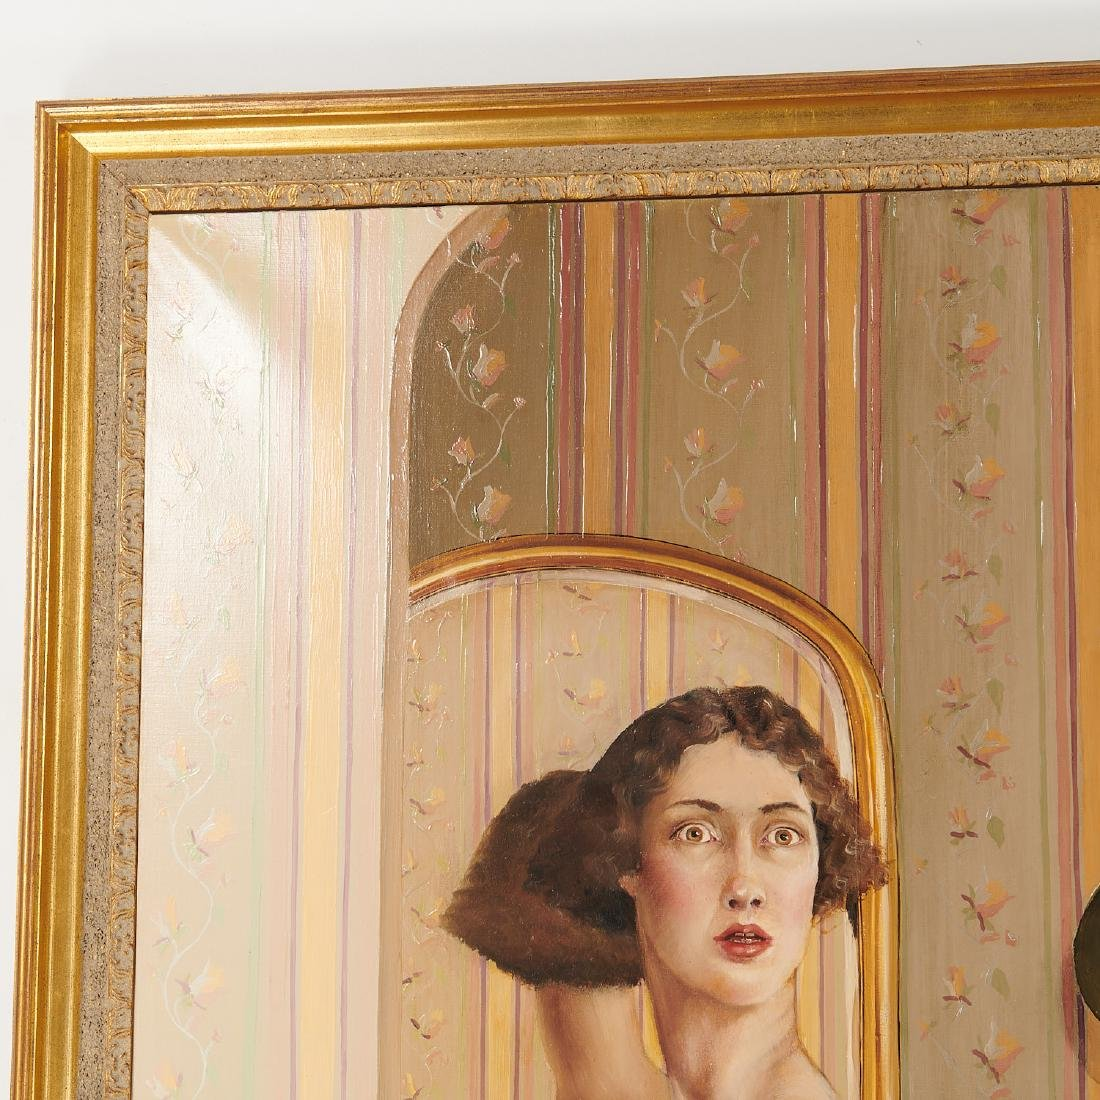 Claire Klarewicz-Okser, large scale painting, 1983 - 2